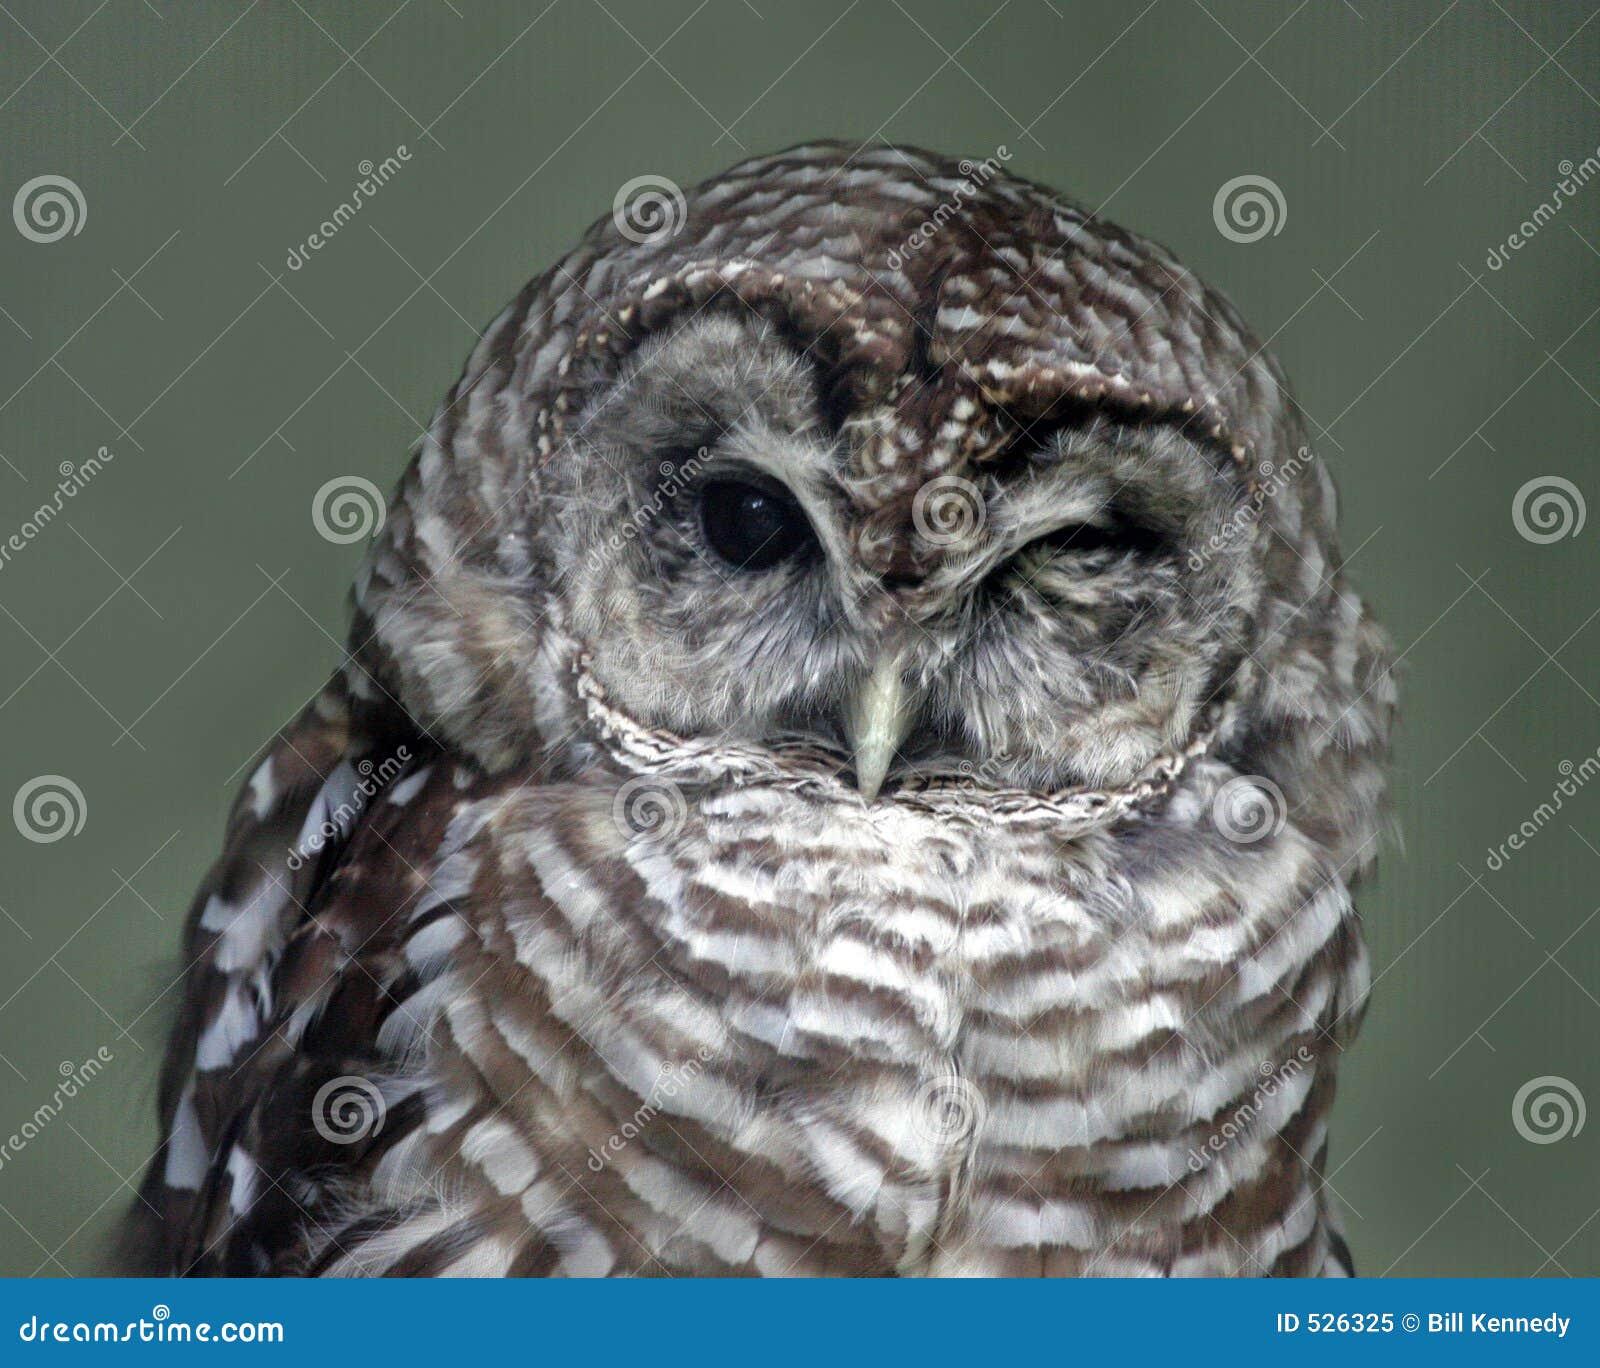 Download 猫头鹰闪光 库存图片. 图片 包括有 公开承认, 避免, 动物园, 察觉, 本质, 掠食性, 残破, 汽车喇叭声 - 526325